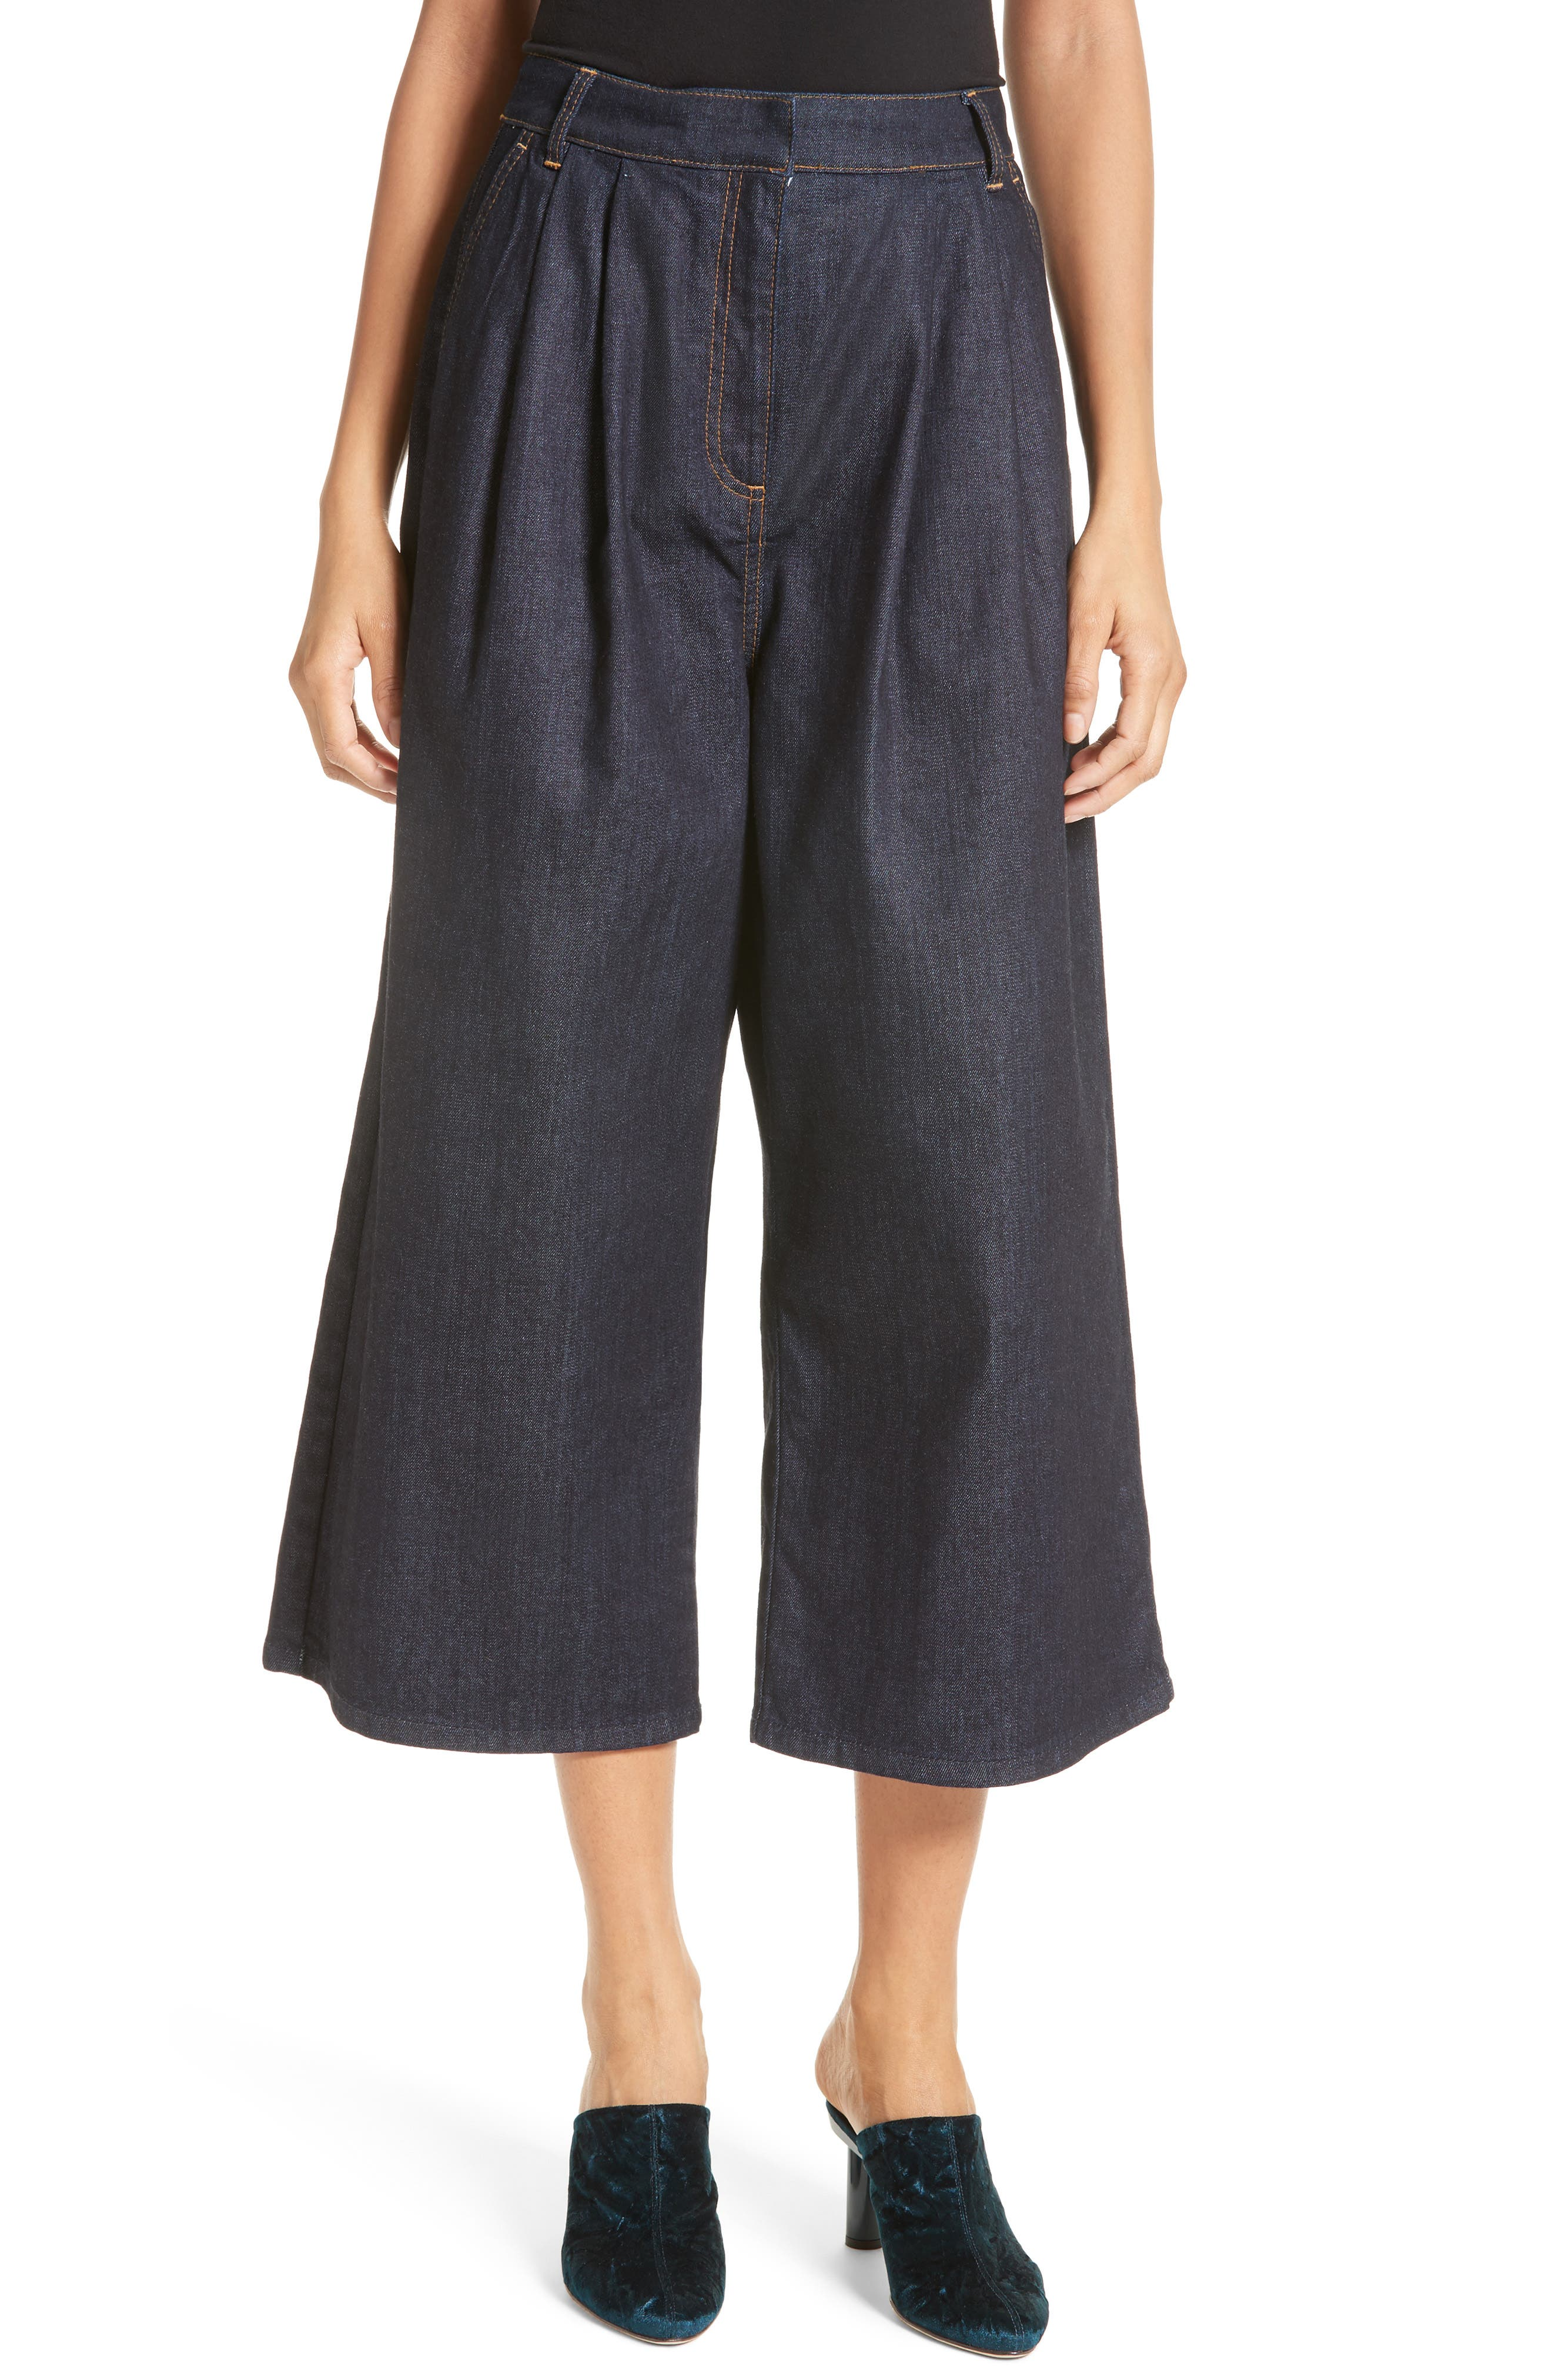 Sam High Waist Culotte Jeans,                         Main,                         color, Dark Denim